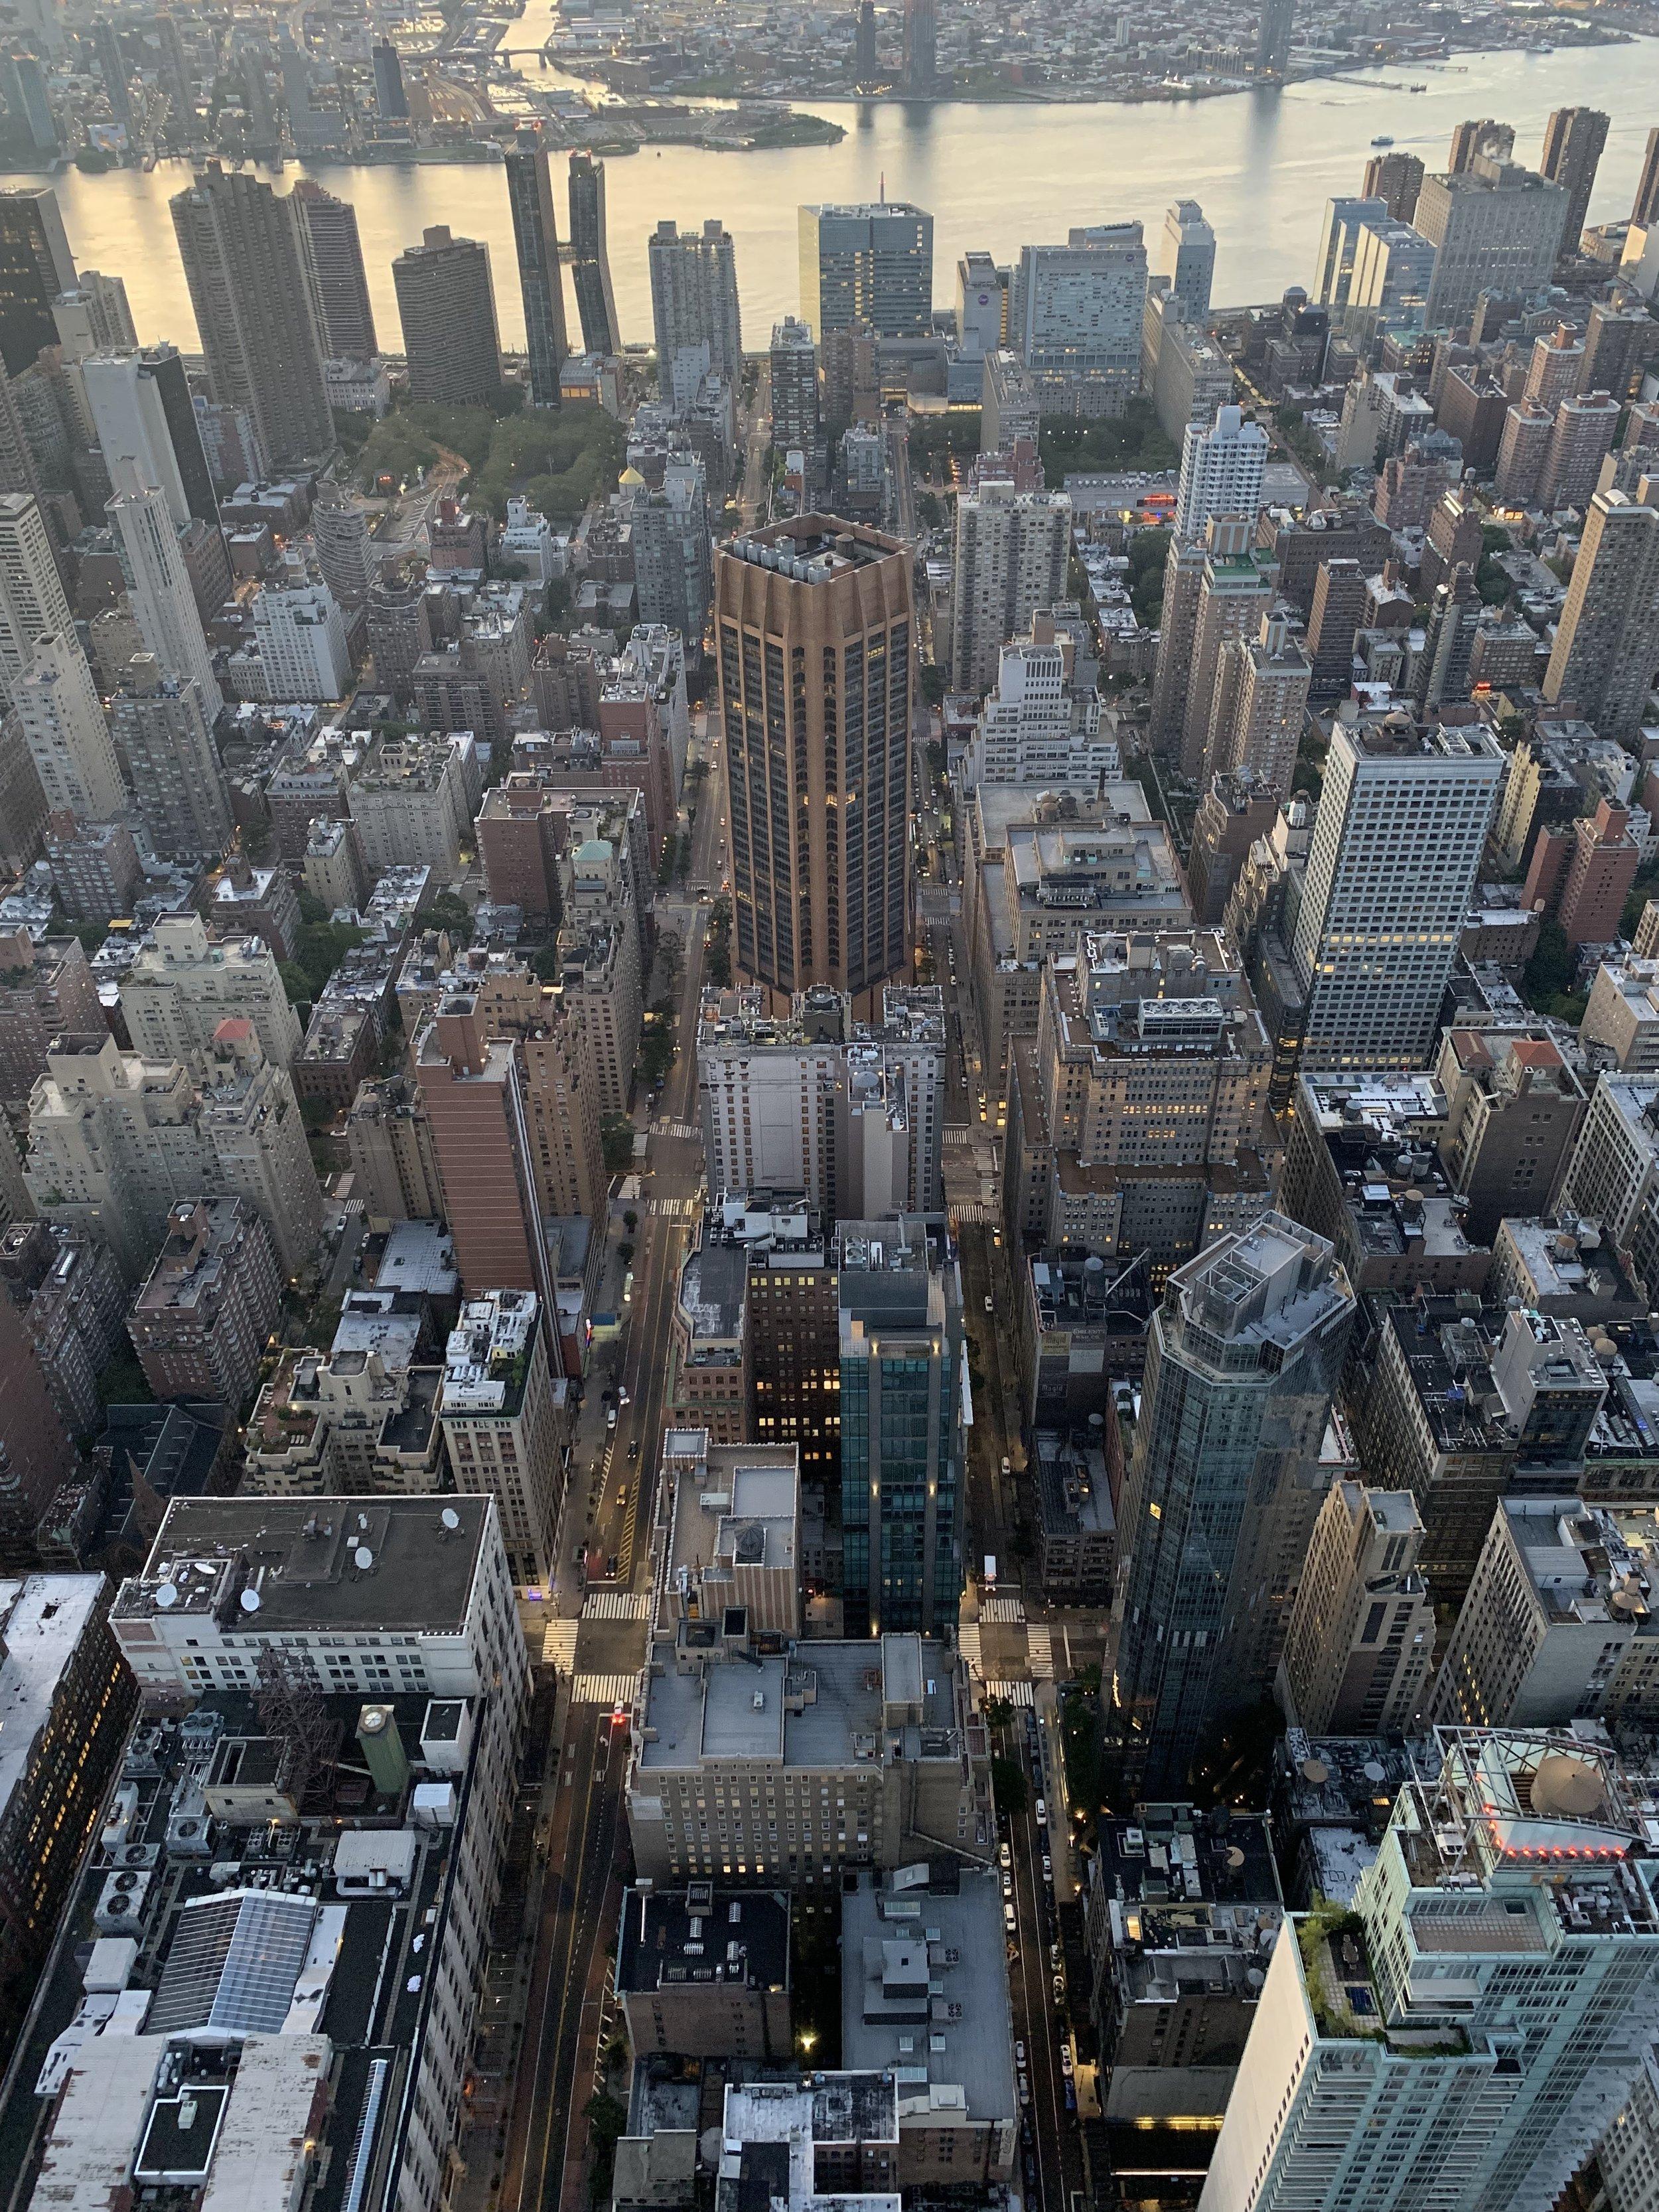 bresheppard.com : NYFW 2019 View Of The City.jpg